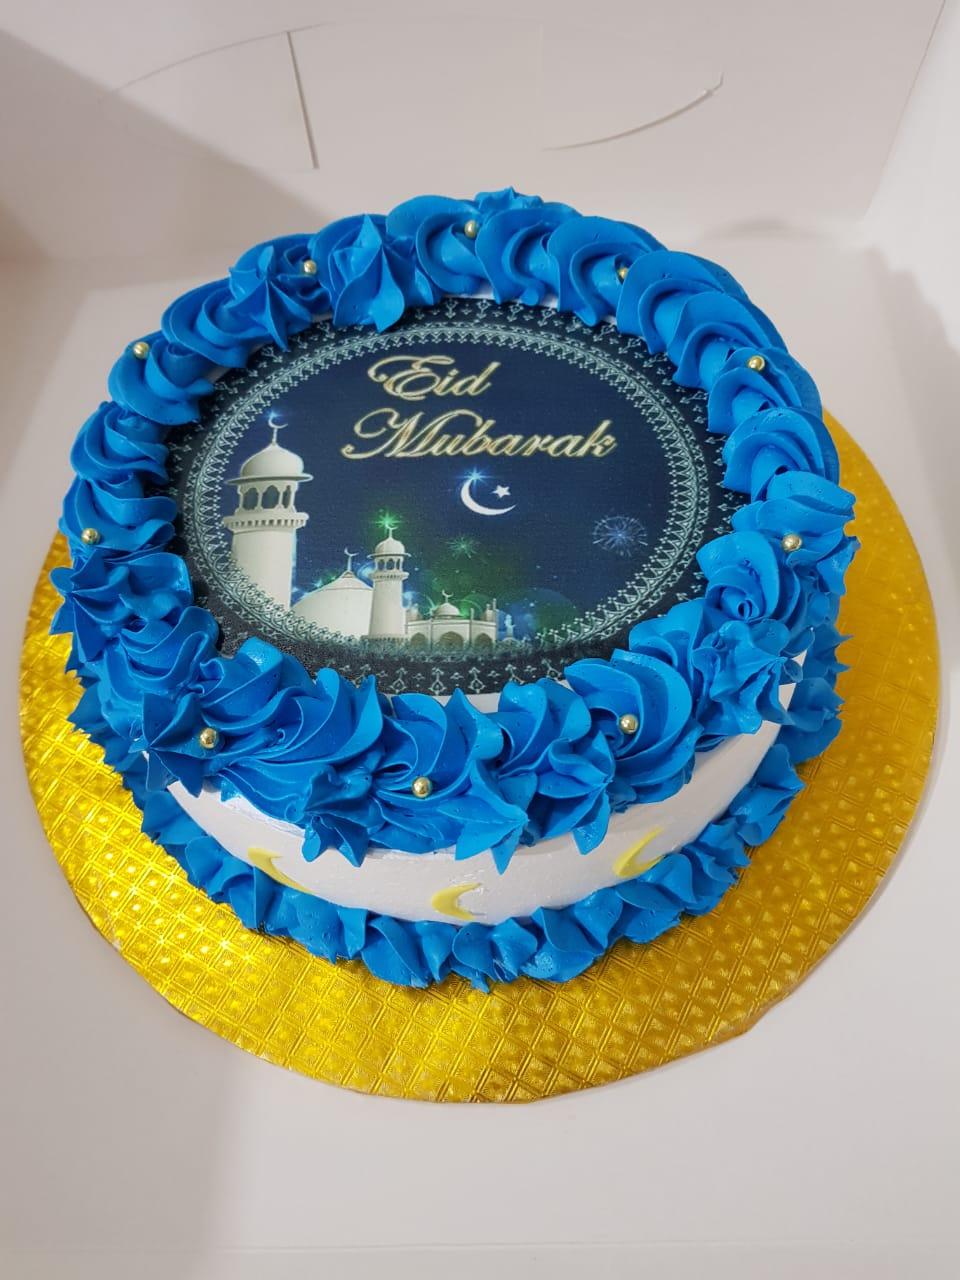 Eid Pic Cake